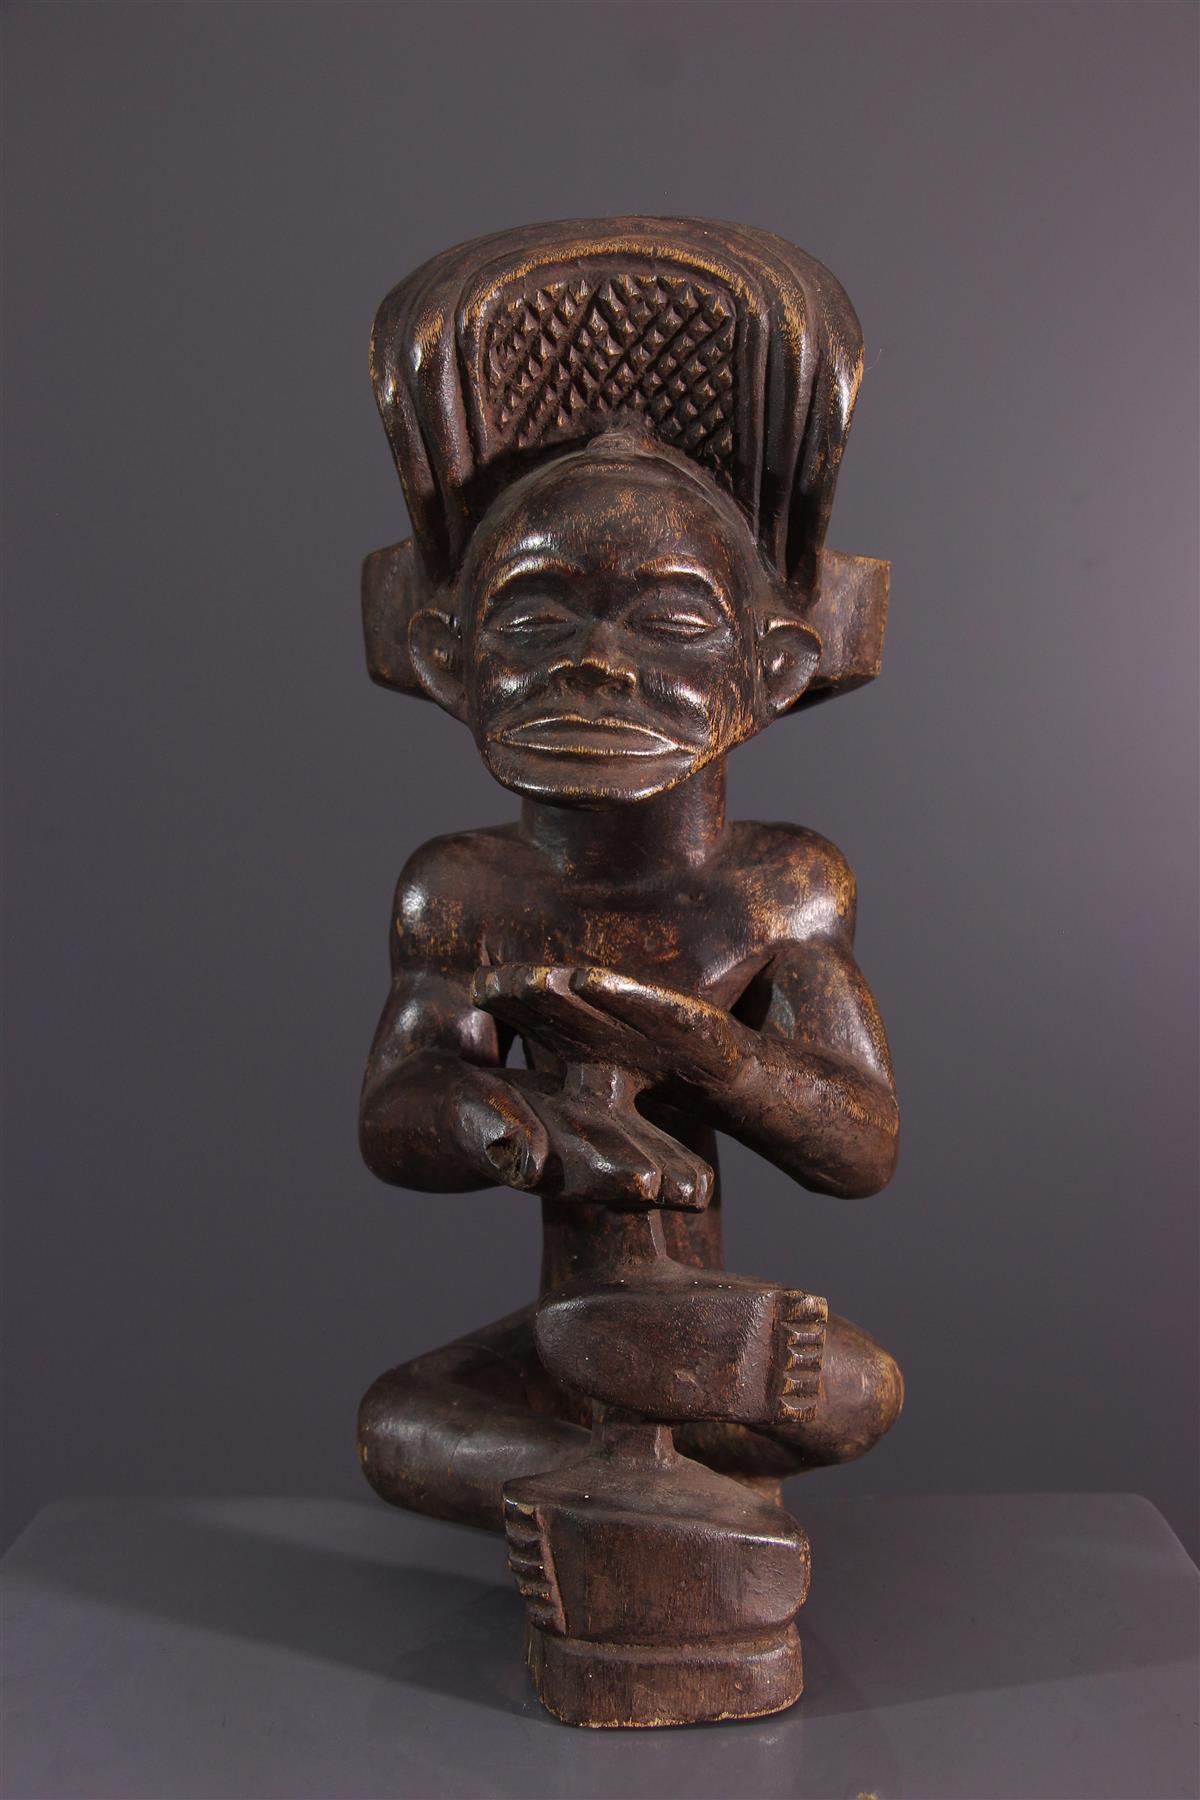 Chibinda Ilunga Chokwe figure - African art